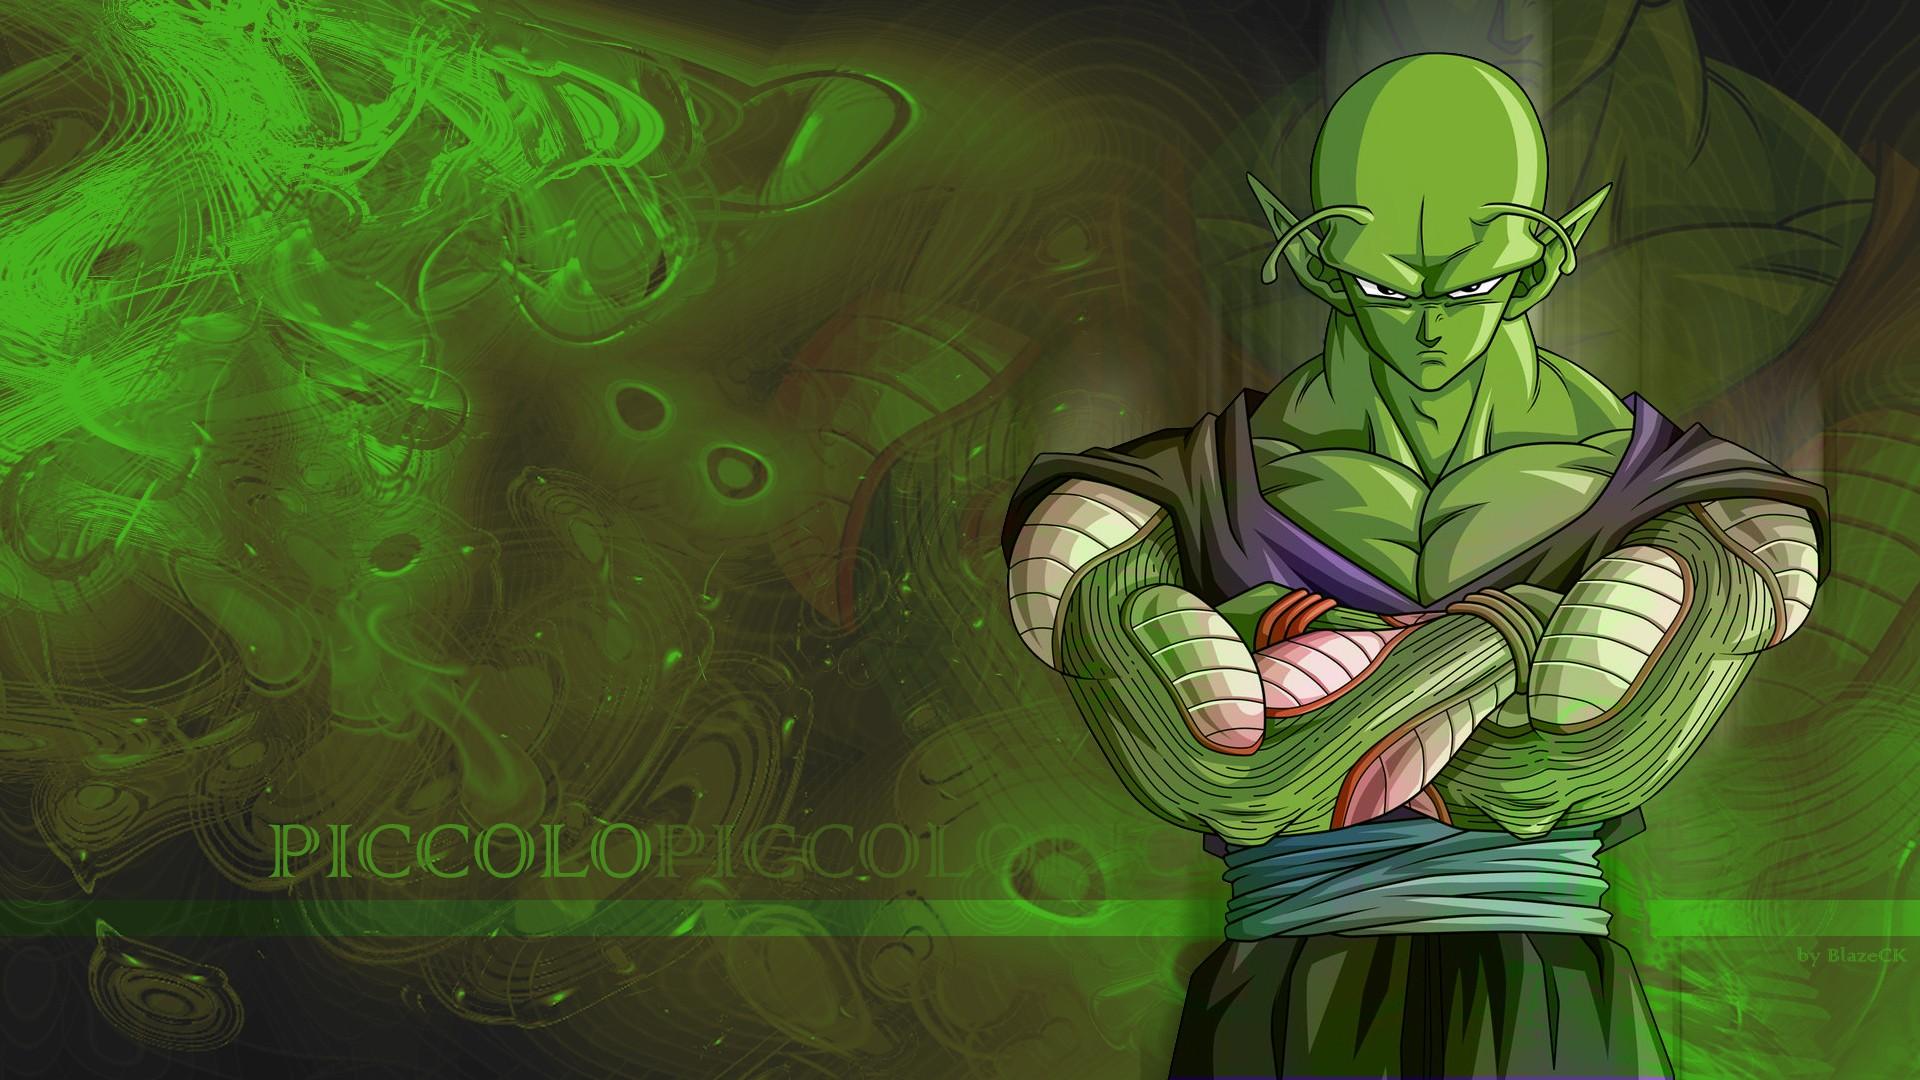 Wallpaper Illustration Anime Green Dragon Ball Z Piccolo